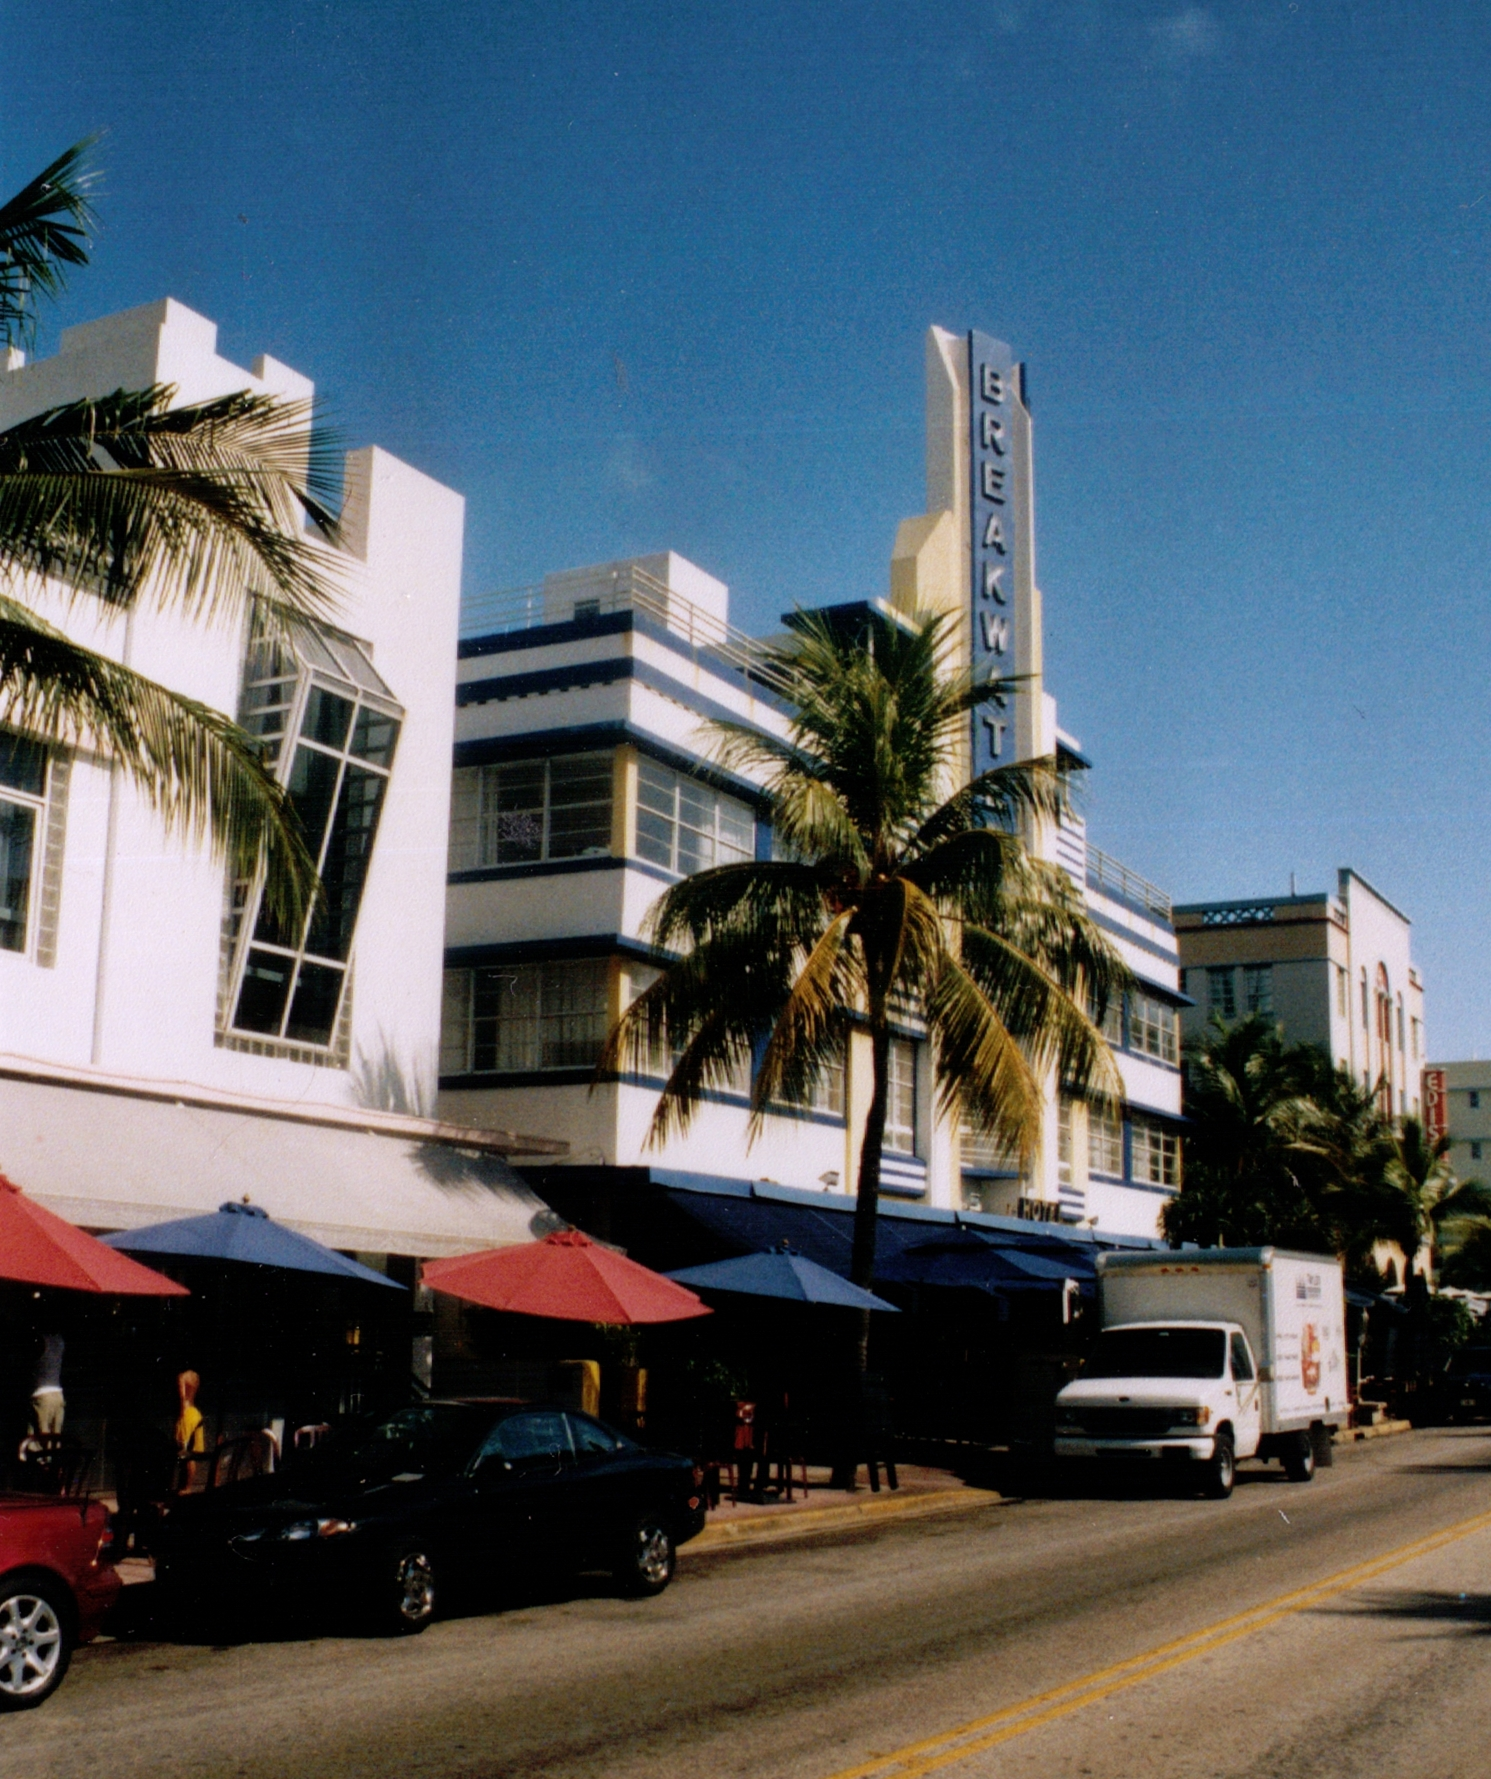 File:Breakwater Hotel Miami.jpg - Wikimedia Commons